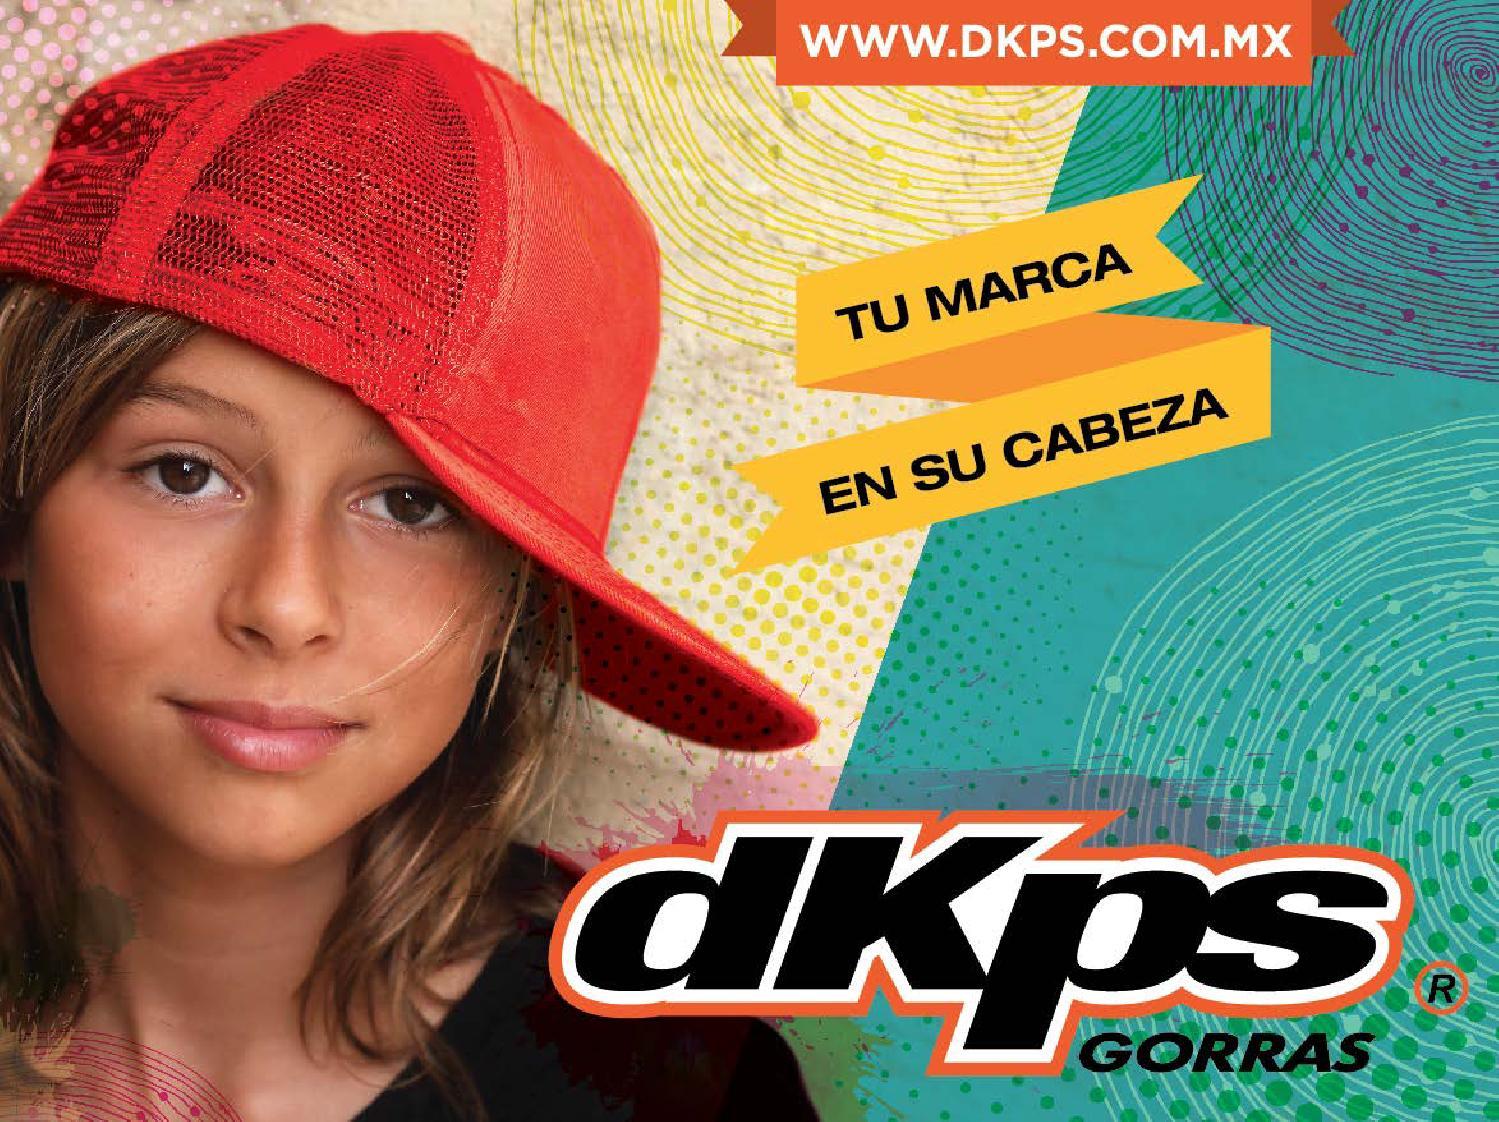 Catalogo gorras DKPS by CUELLO BLANCO DKPS MAYORK  queretaro playerasymas.com.mx - issuu 668683fb88c